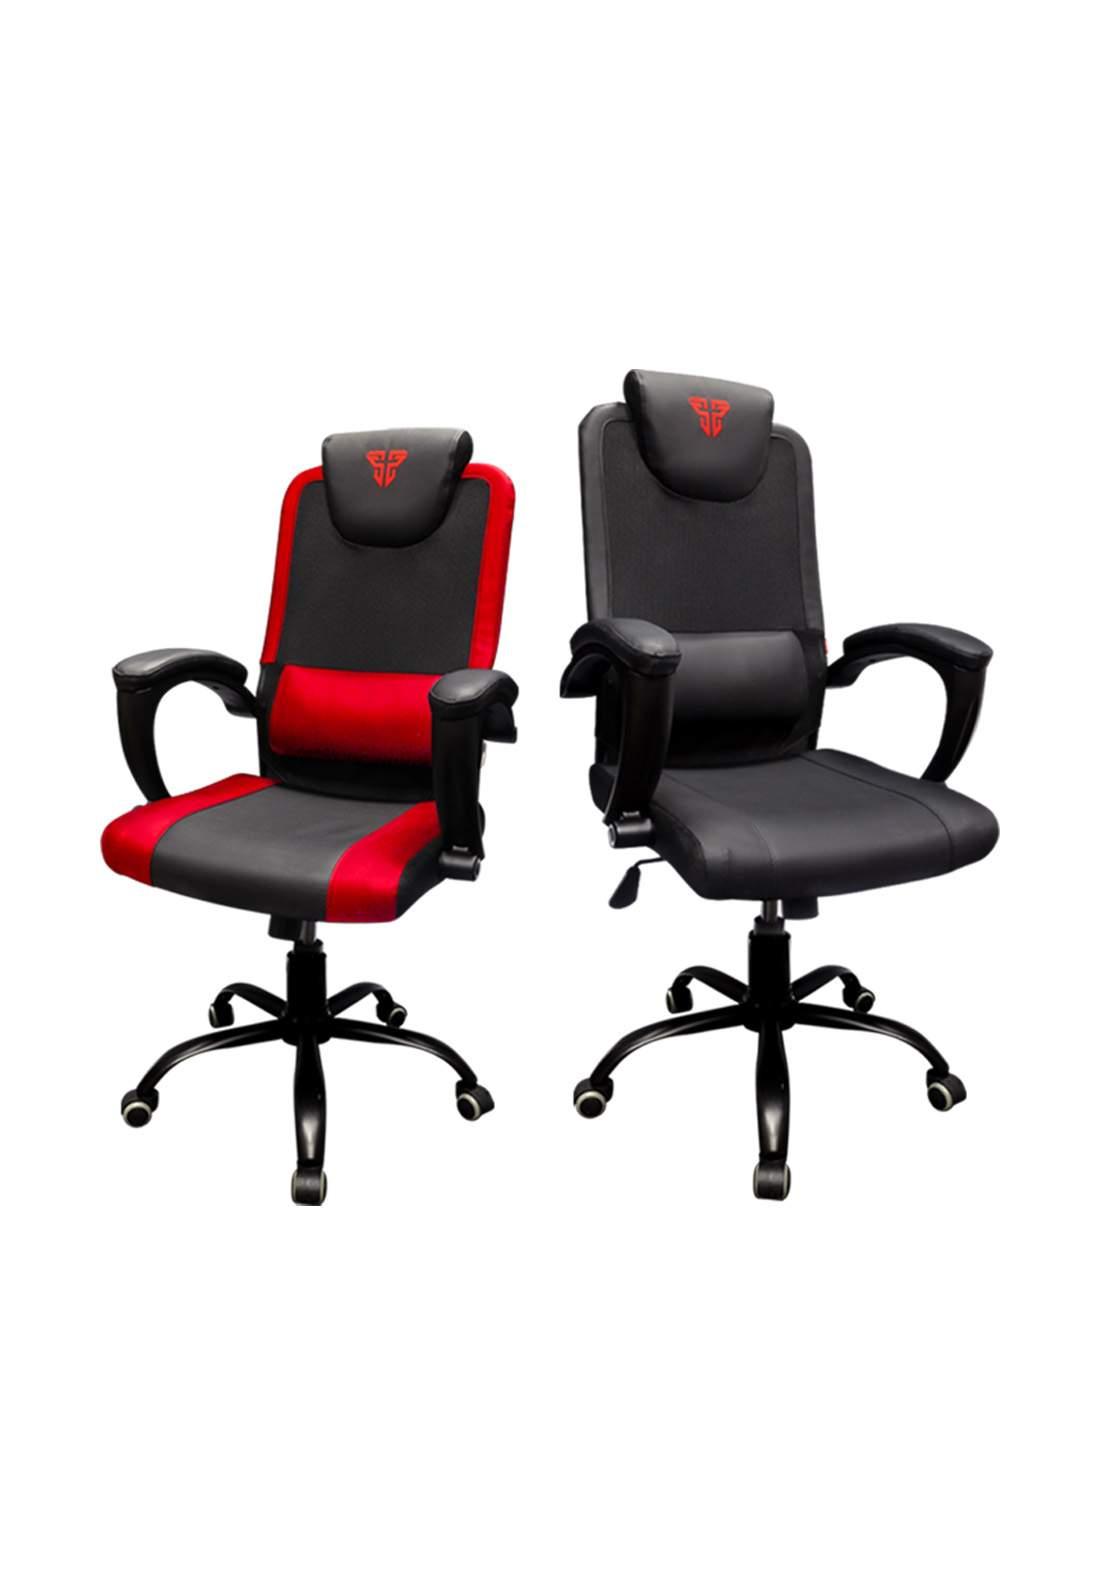 Fantech Alpha GC-185X Gaming Chair Comfortable Luxury Chair For Computer كرسي ألعاب